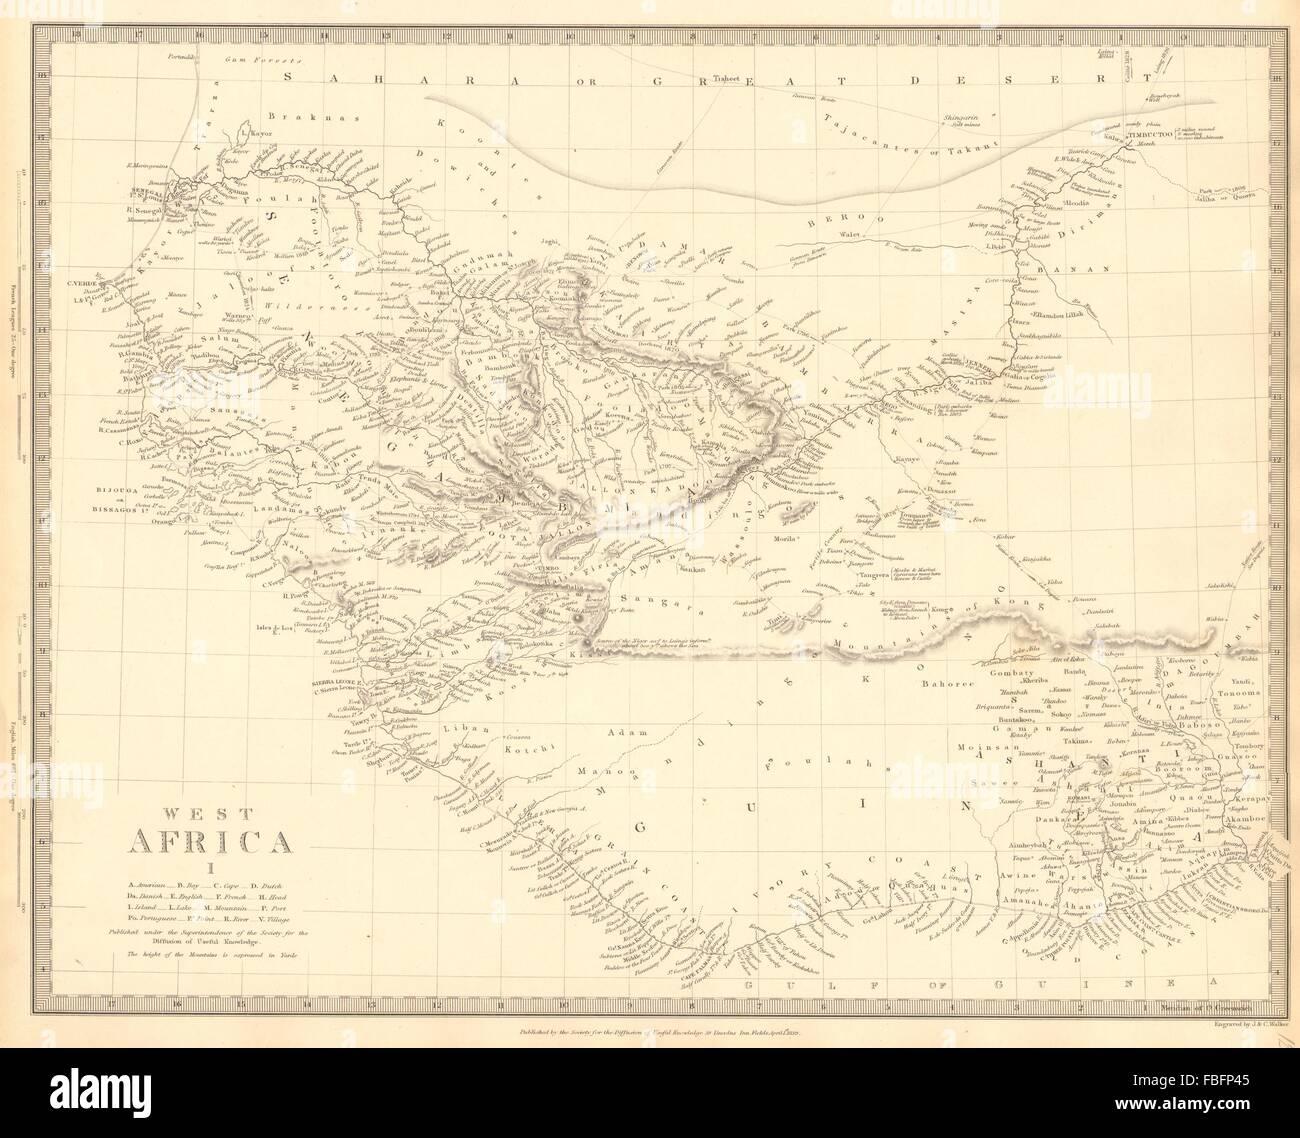 Gambia West Africa Map.West Africa Senegal Gambia Guinea Ashanti Ivory Gold Grain